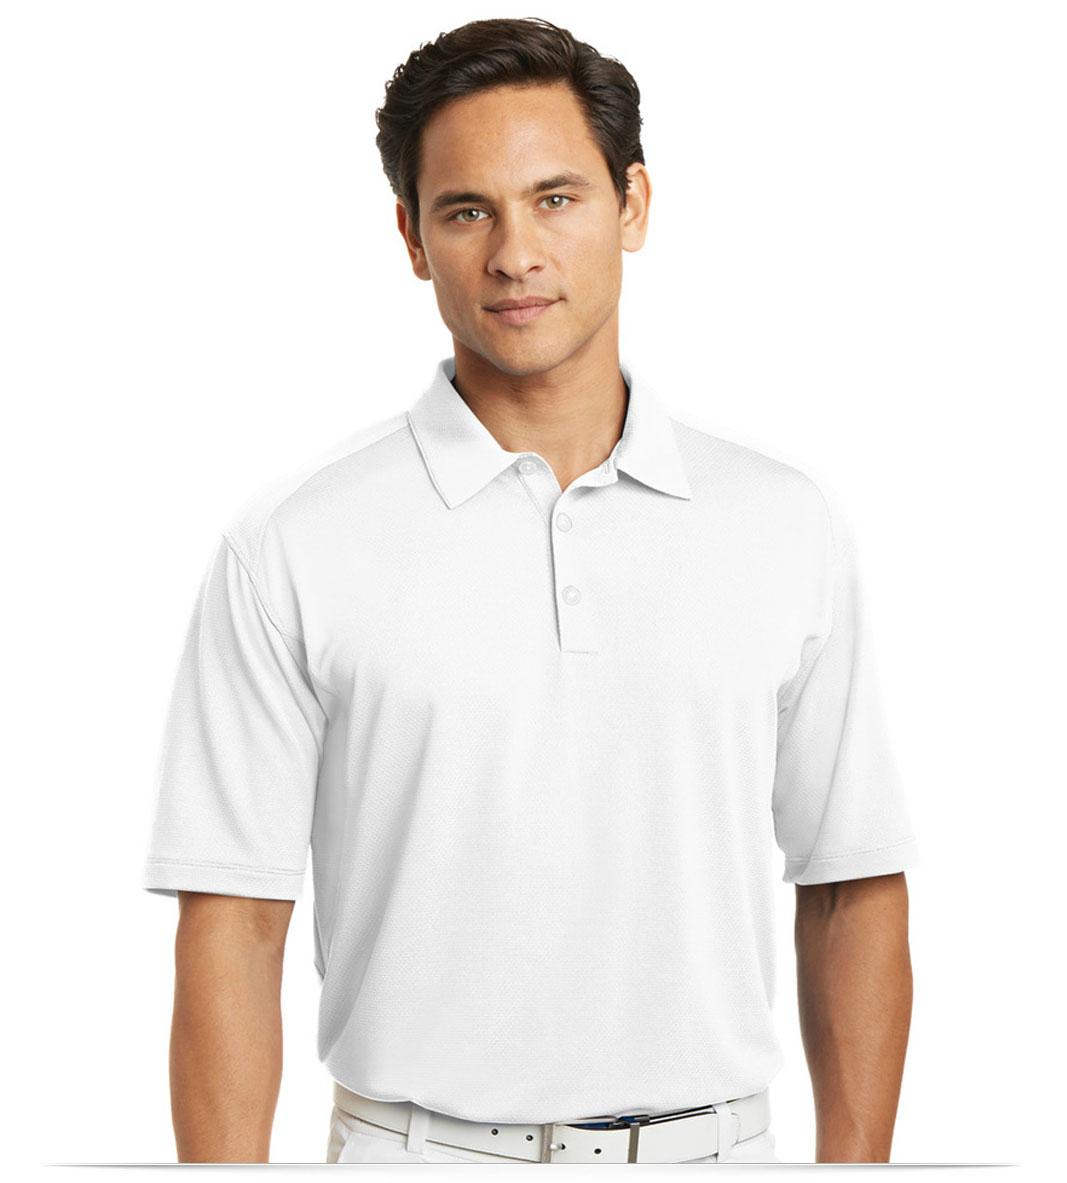 Design Custom Embroidered Nike Golf Shirt Online At Allstar Logo